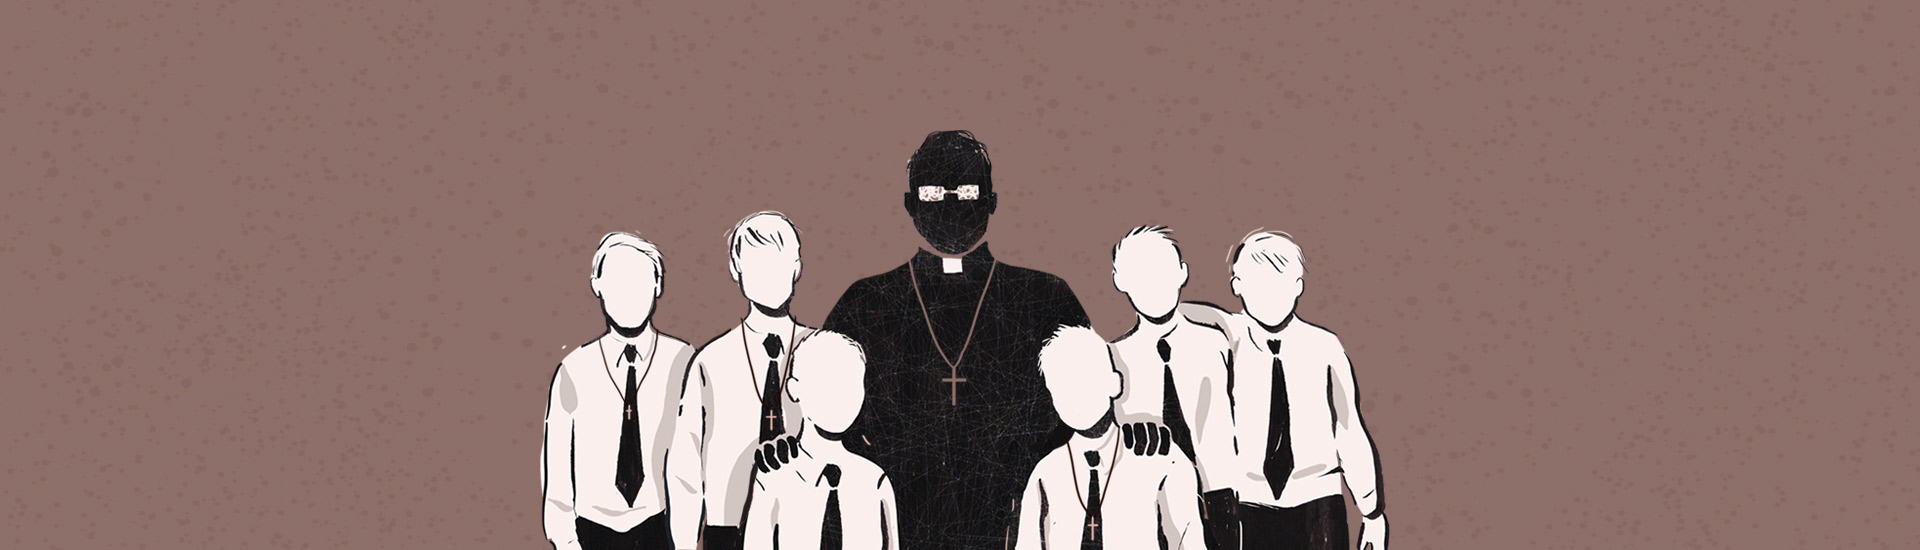 Casos de abuso sexual en iglesia católica de Guayaquil por sacerdote Luis Fernando Intriago